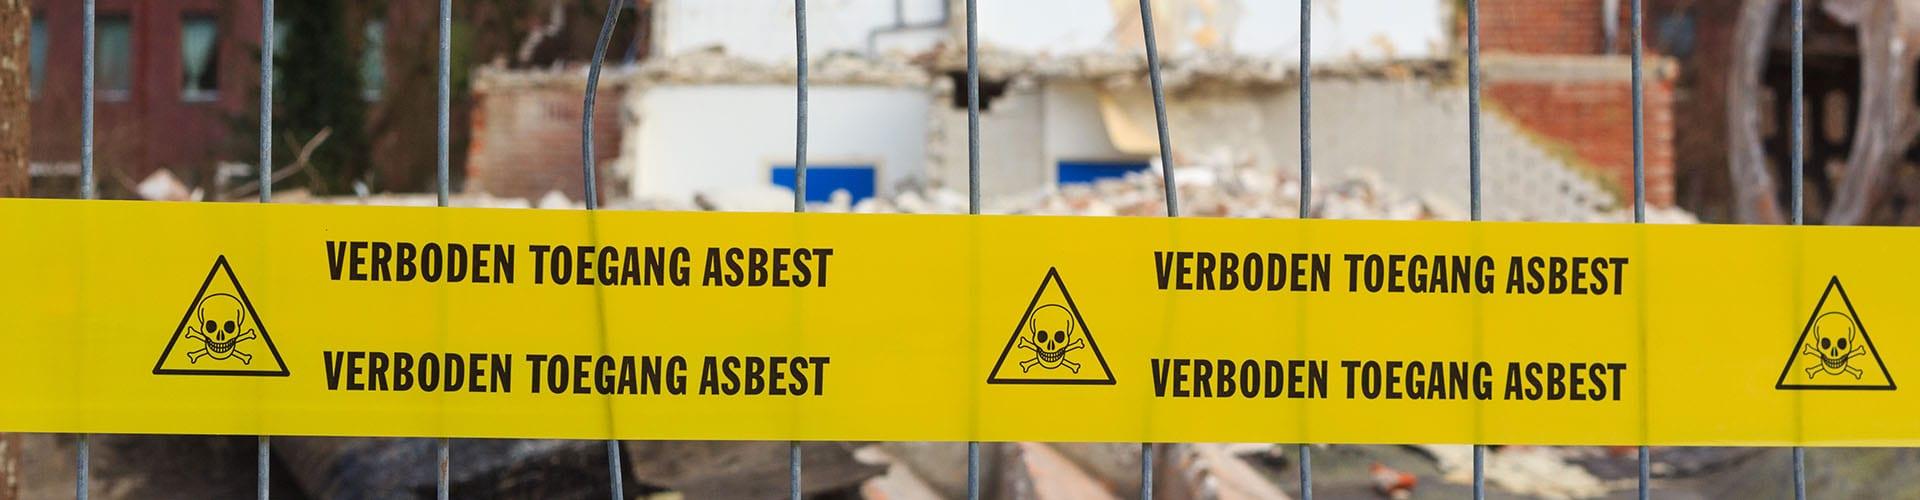 Milieu Control NL asbestsanering in Utrecht